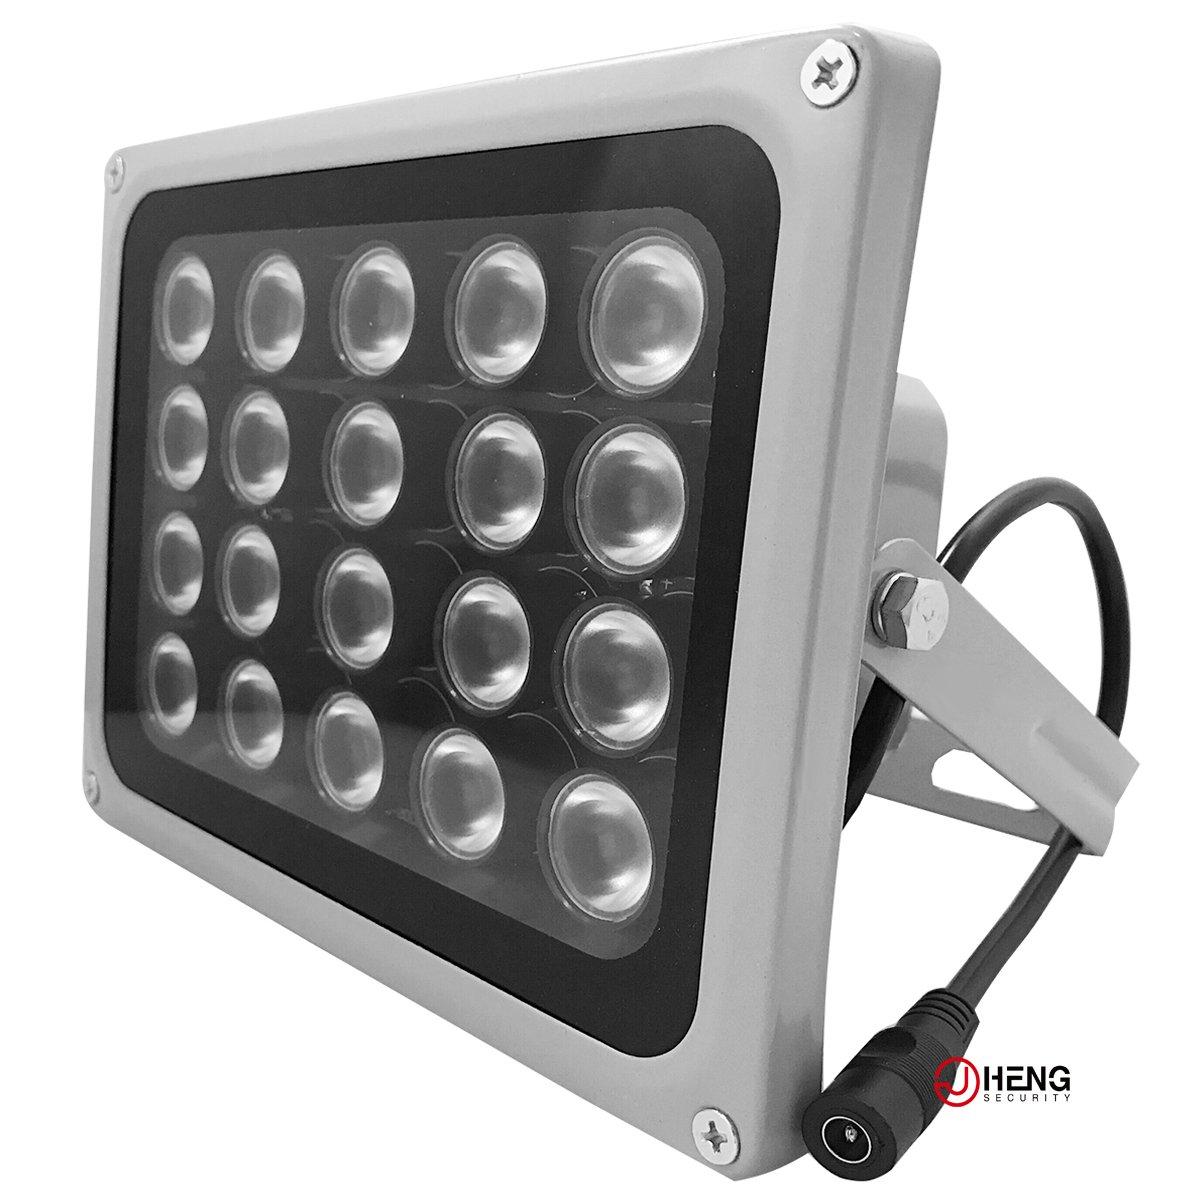 JC Infrared Illuminator, 850nm 20 Leds 90 Degree Wide Angle IR Illuminator for Night Vision,Waterproof LED Infrared Light-LITE VERSION